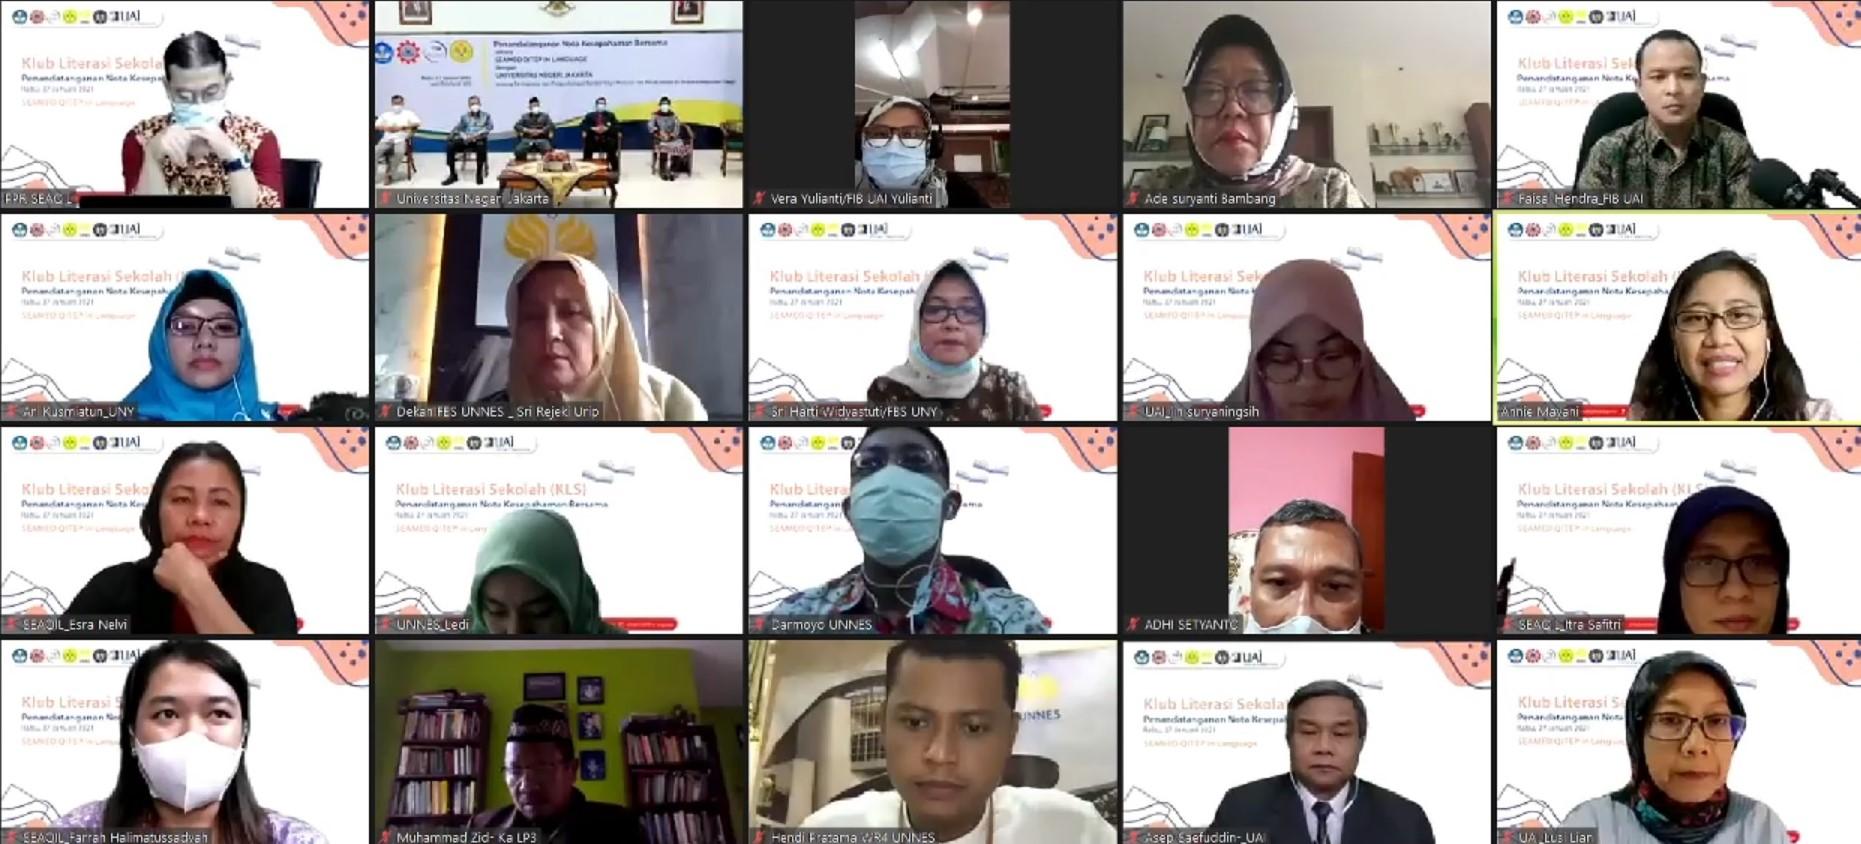 Kerjasama UNJ dan SEAMEO QITEP in Language : Pengembangan dan Peningkatan Sumber Daya Manusia dalam Pendidikan